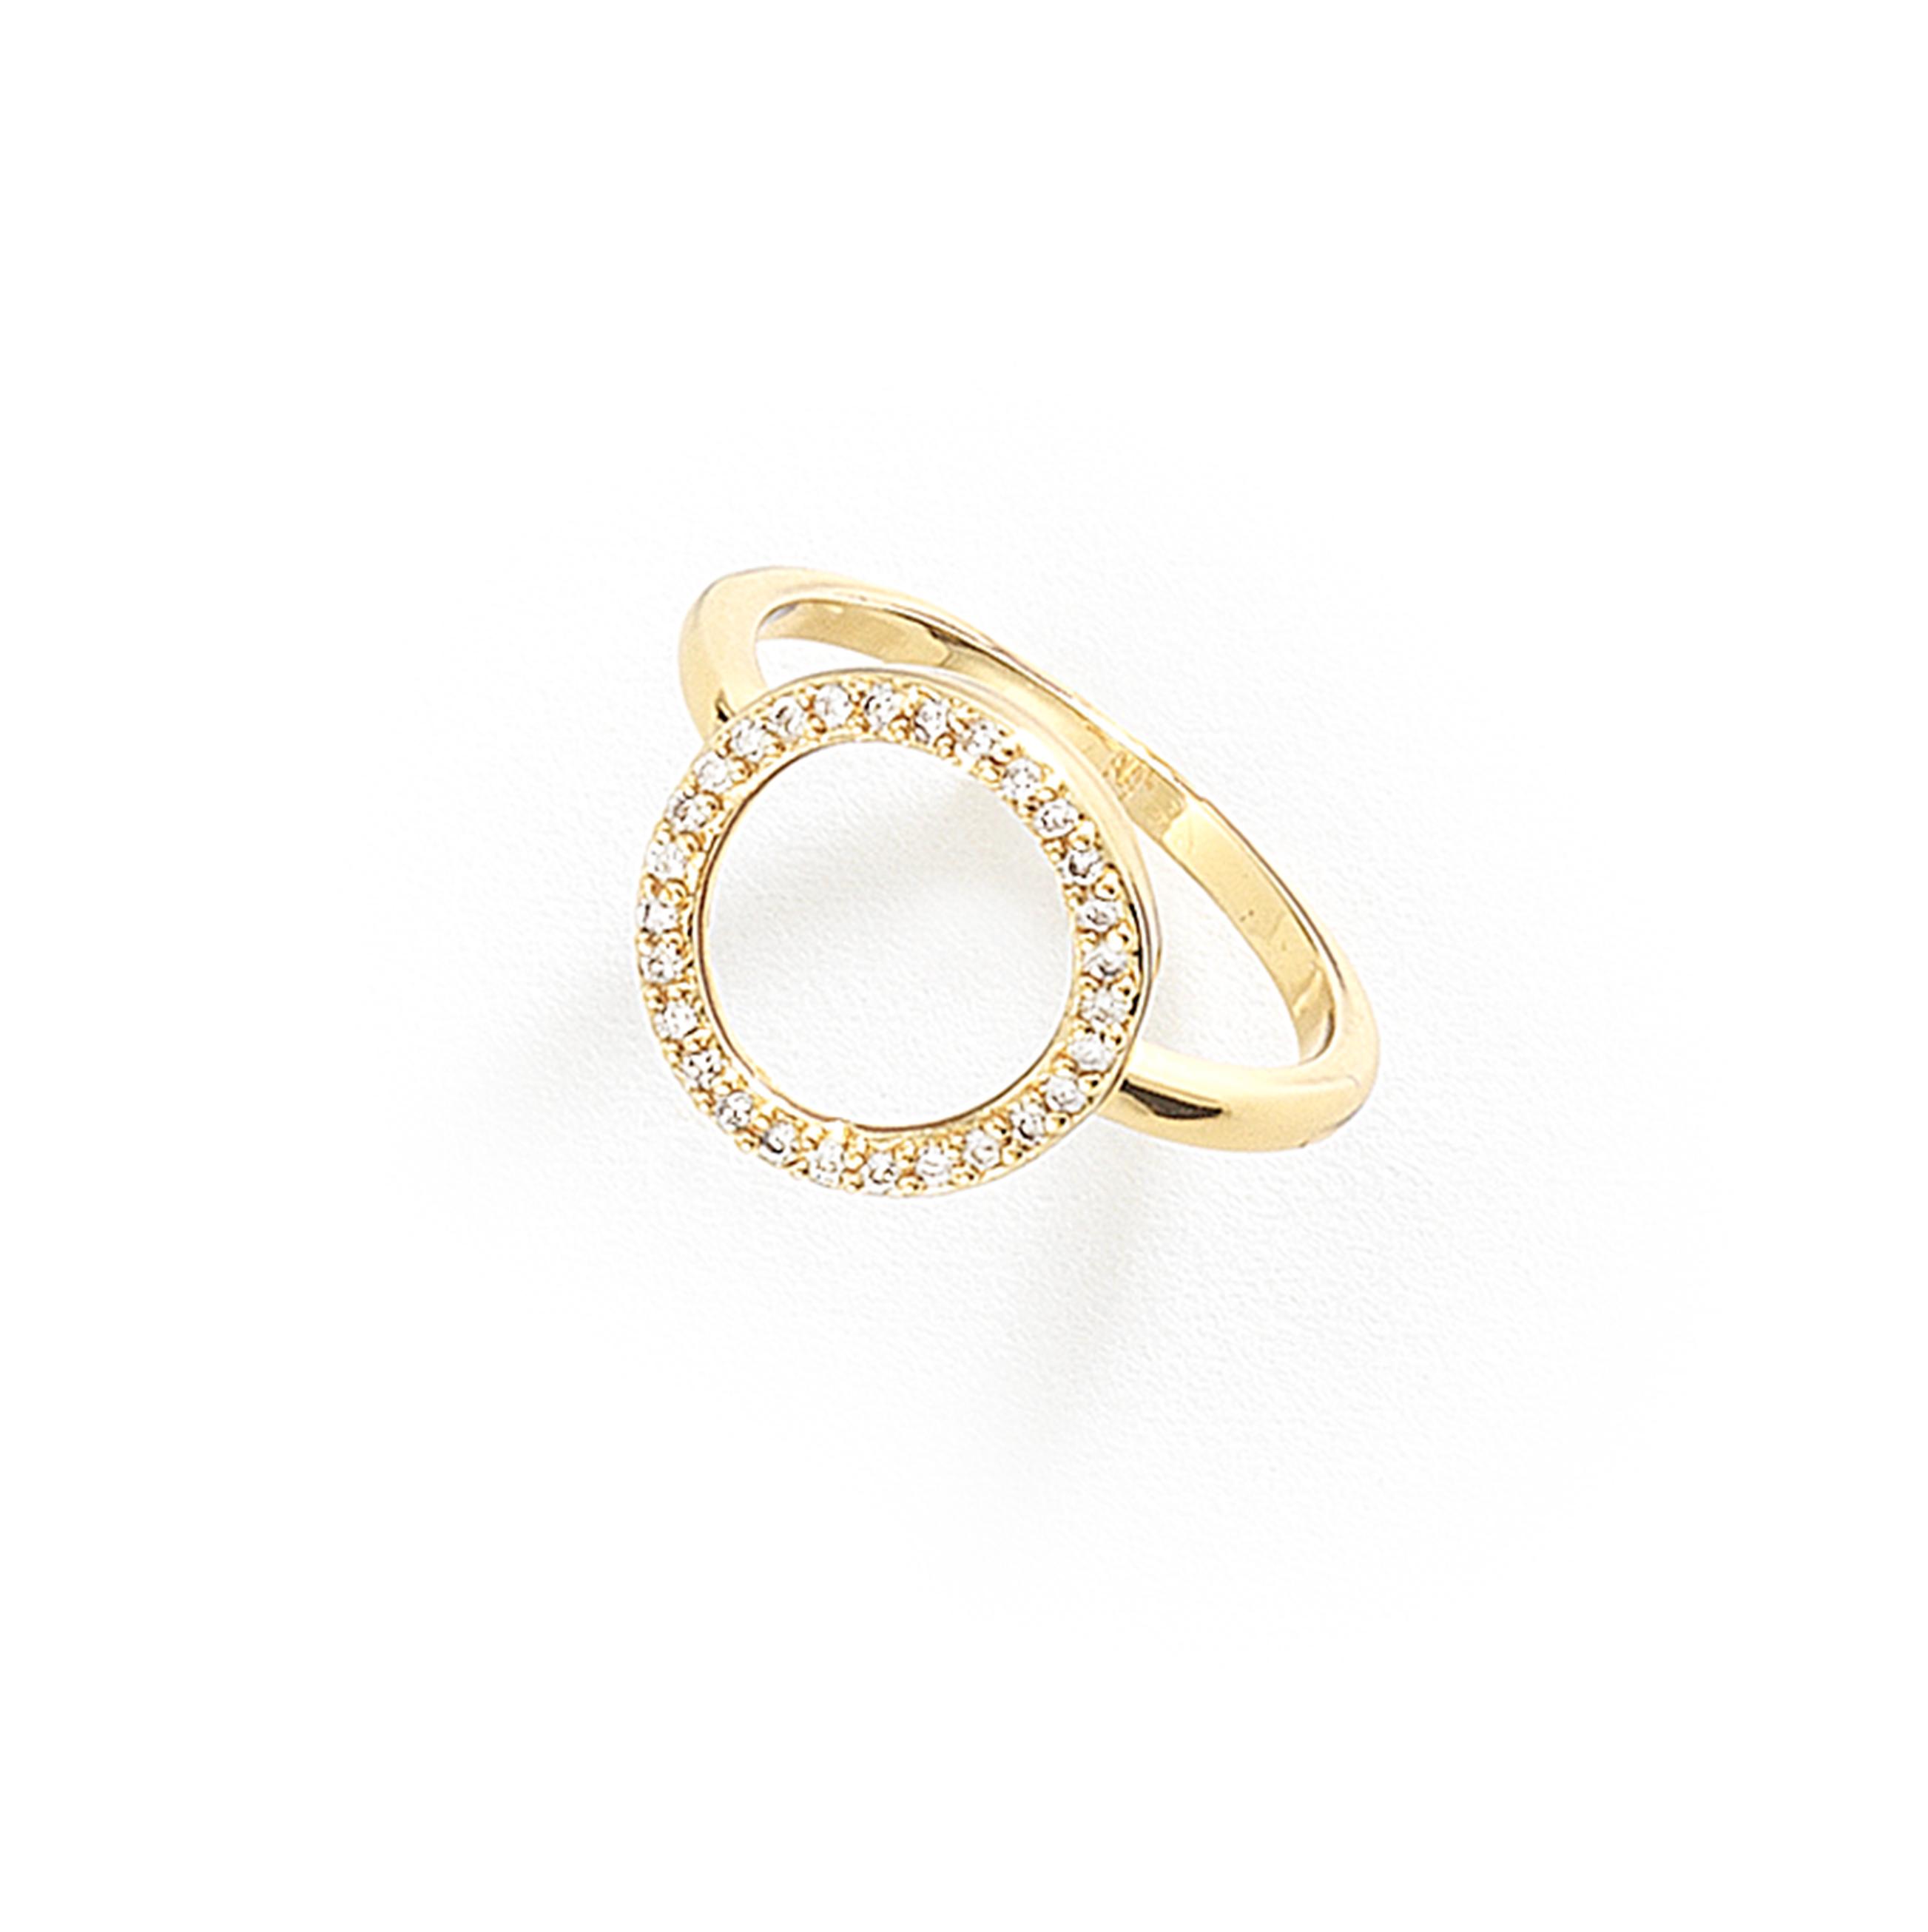 b3c5492e902d Anillo con 4 baños de oro de 18 kilates con un hermoso elemento central  circular con piedras de cristal. Diseño clásico y atemporal.